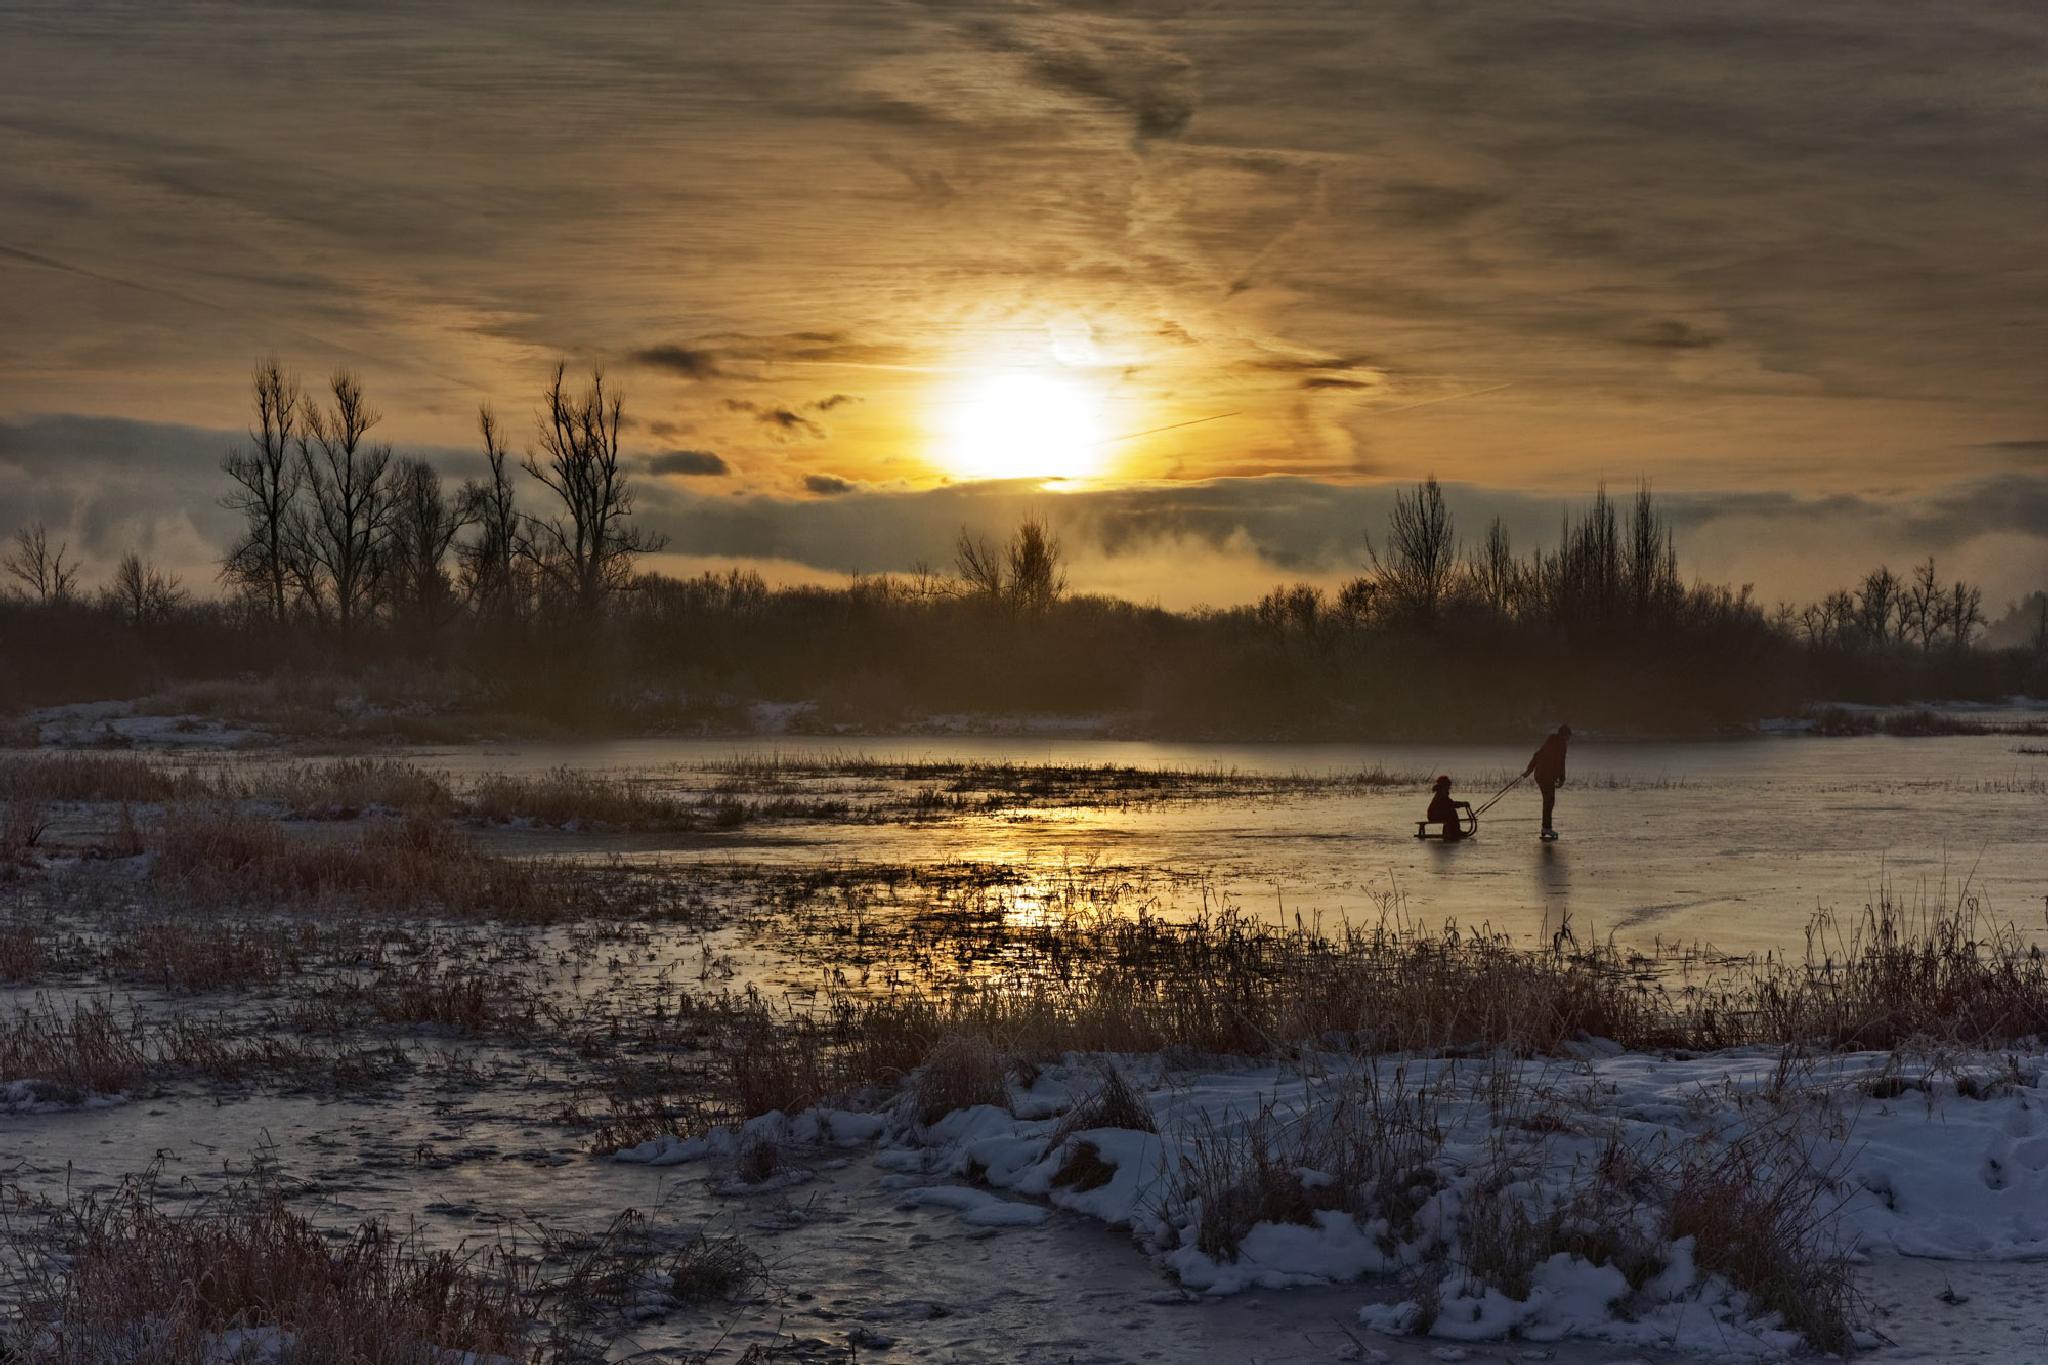 Having fun on lake Cerknica by Marko Erman